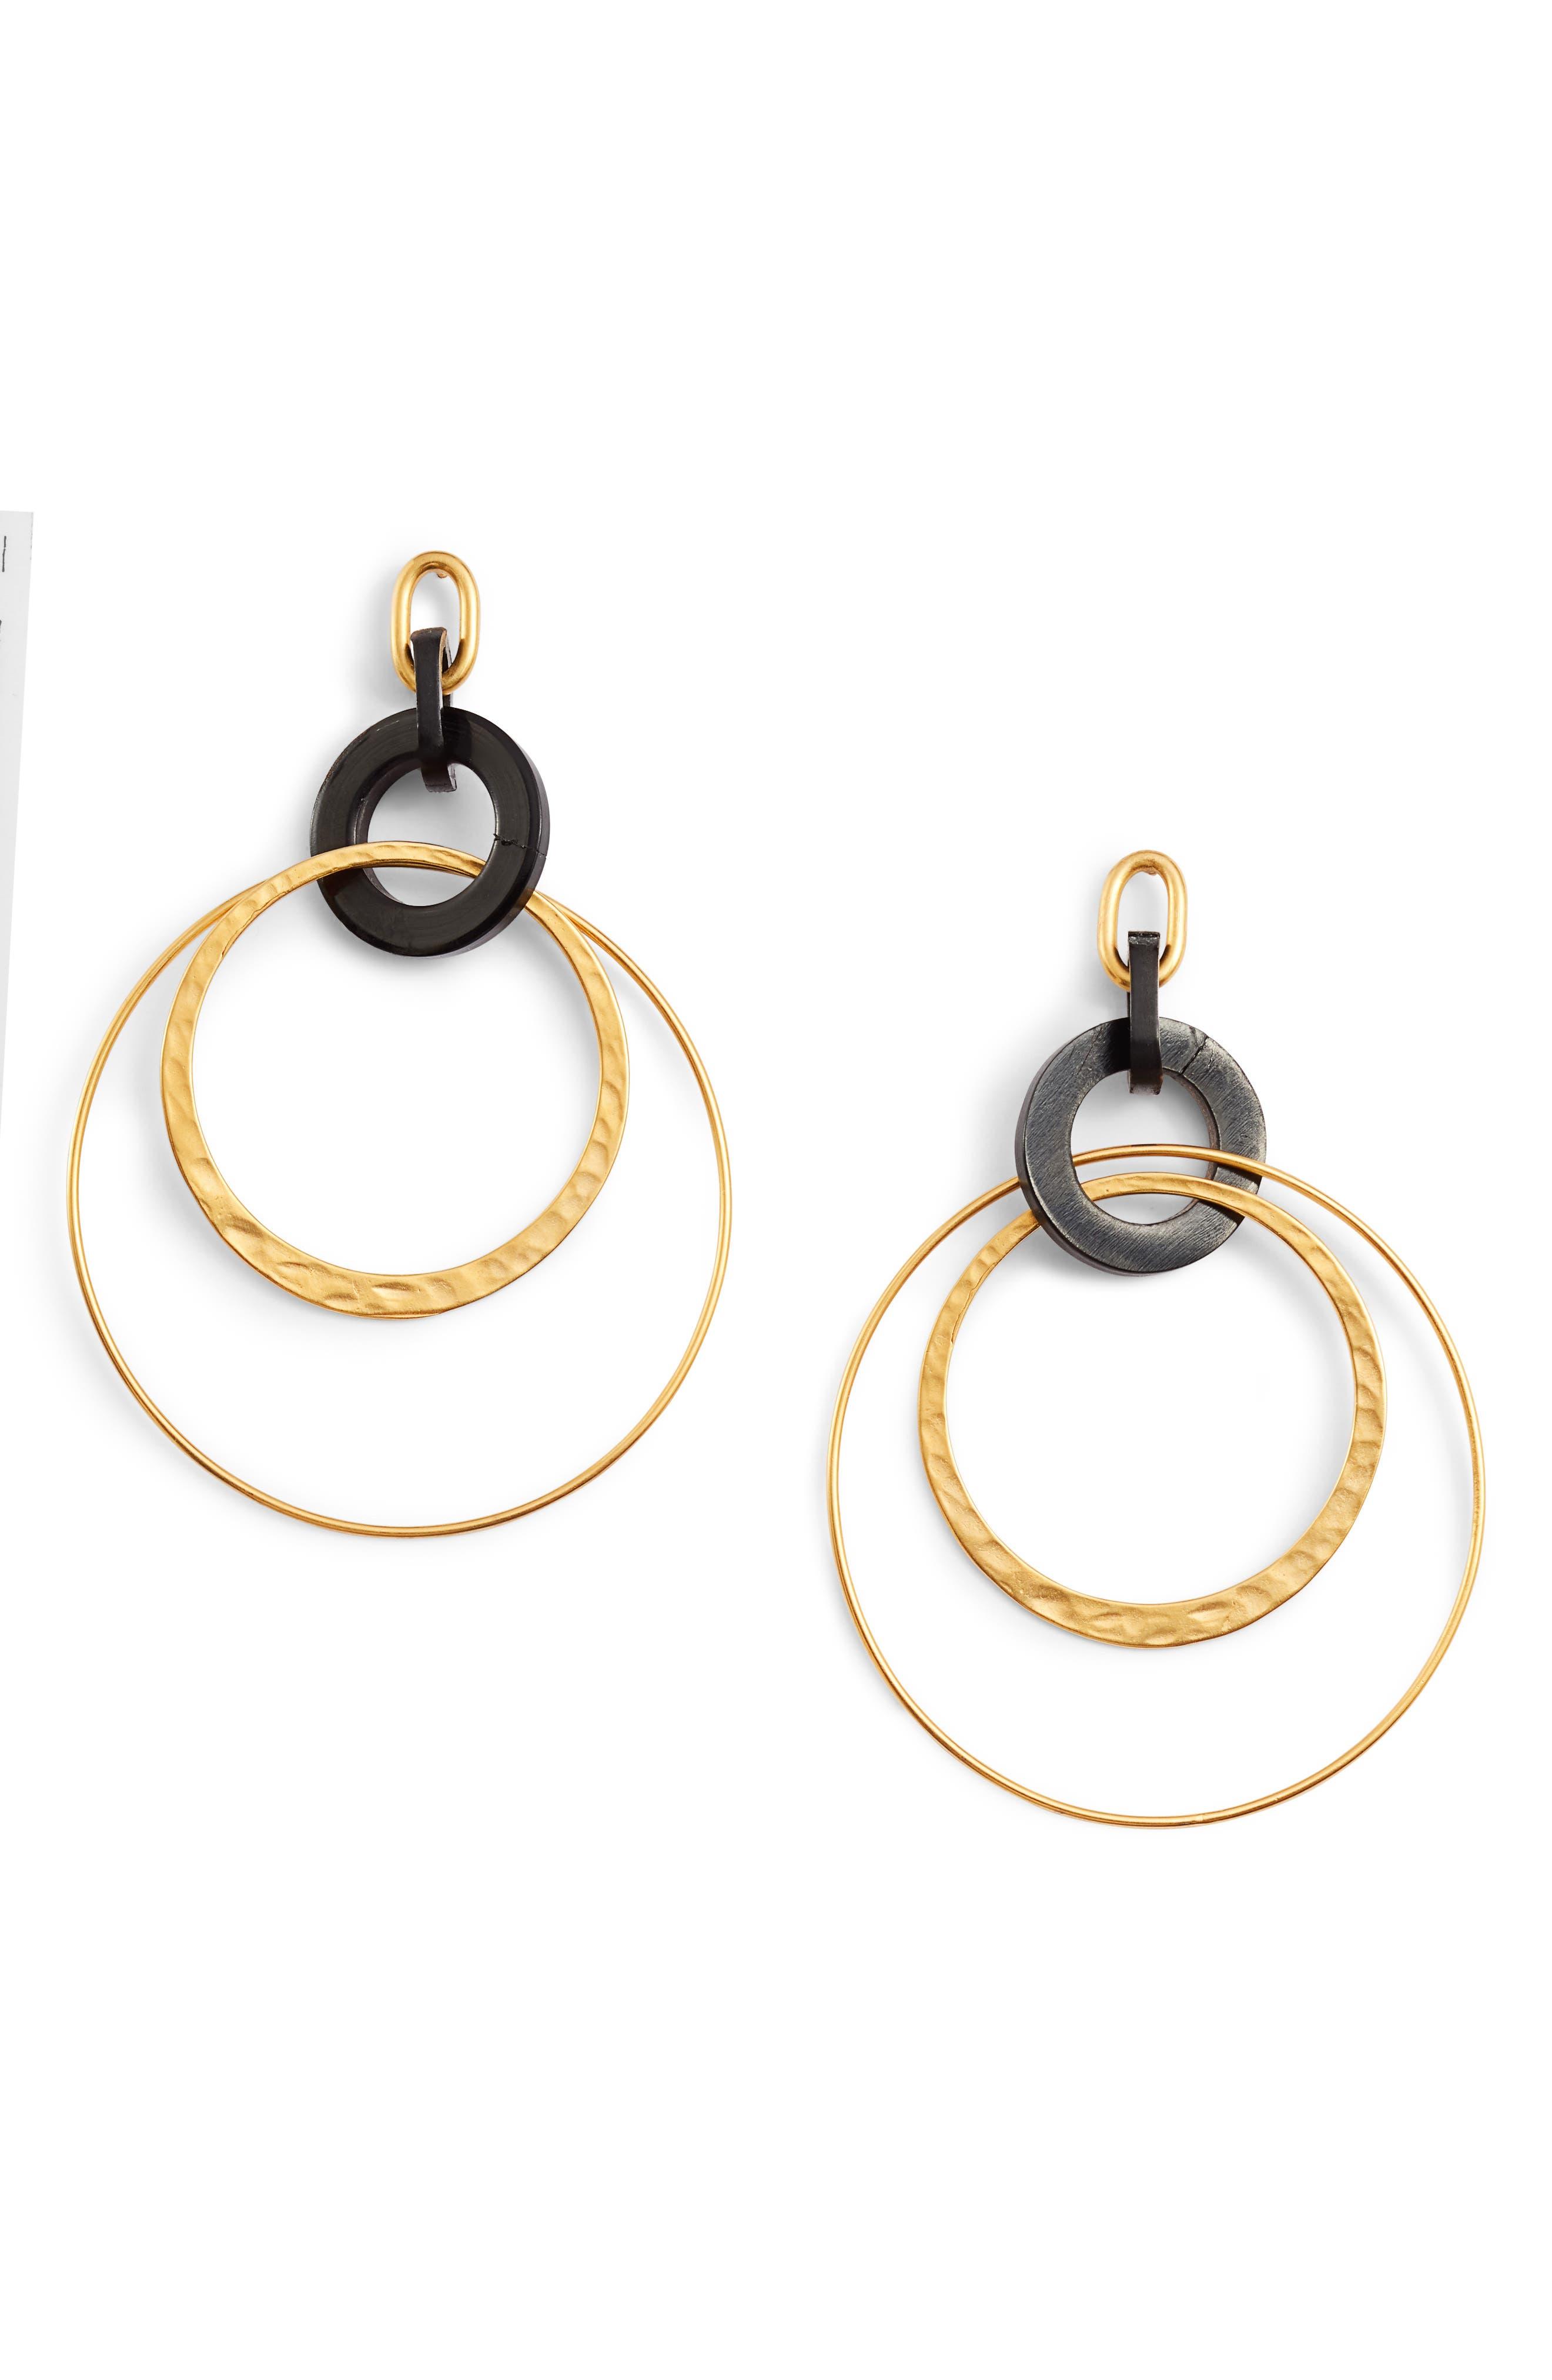 Horn Hoop Earrings,                             Main thumbnail 1, color,                             BLACK HORN